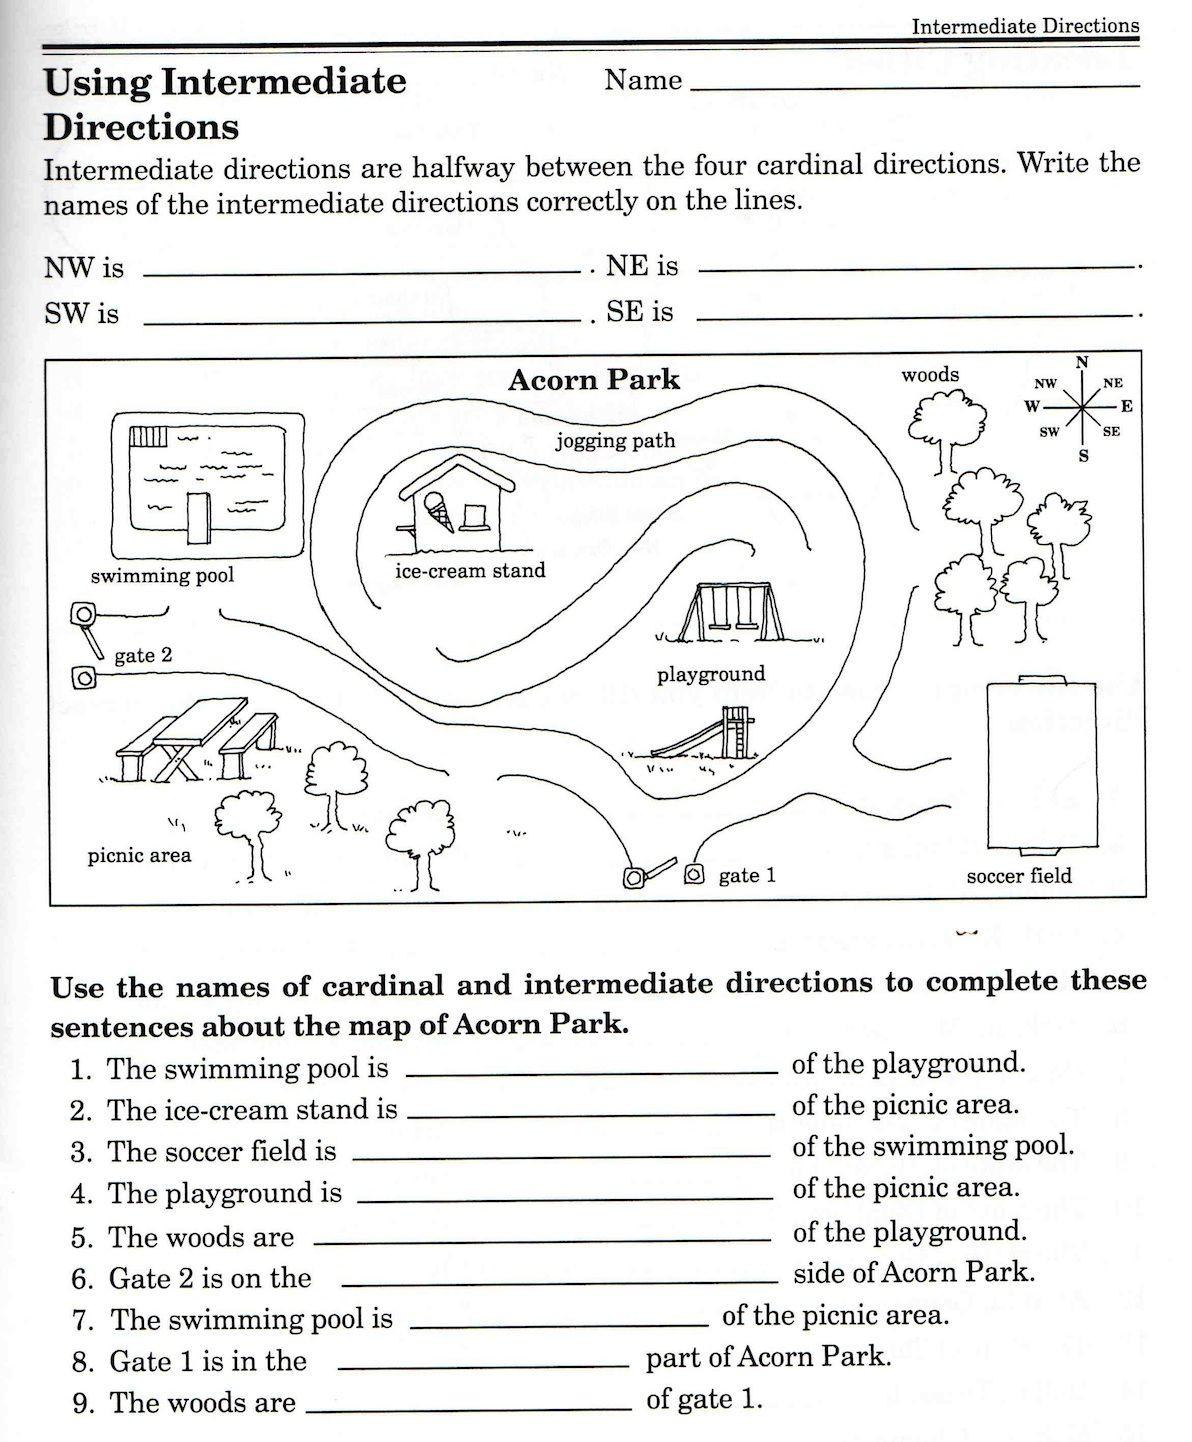 Second Grade History Worksheets social Stu S Skills